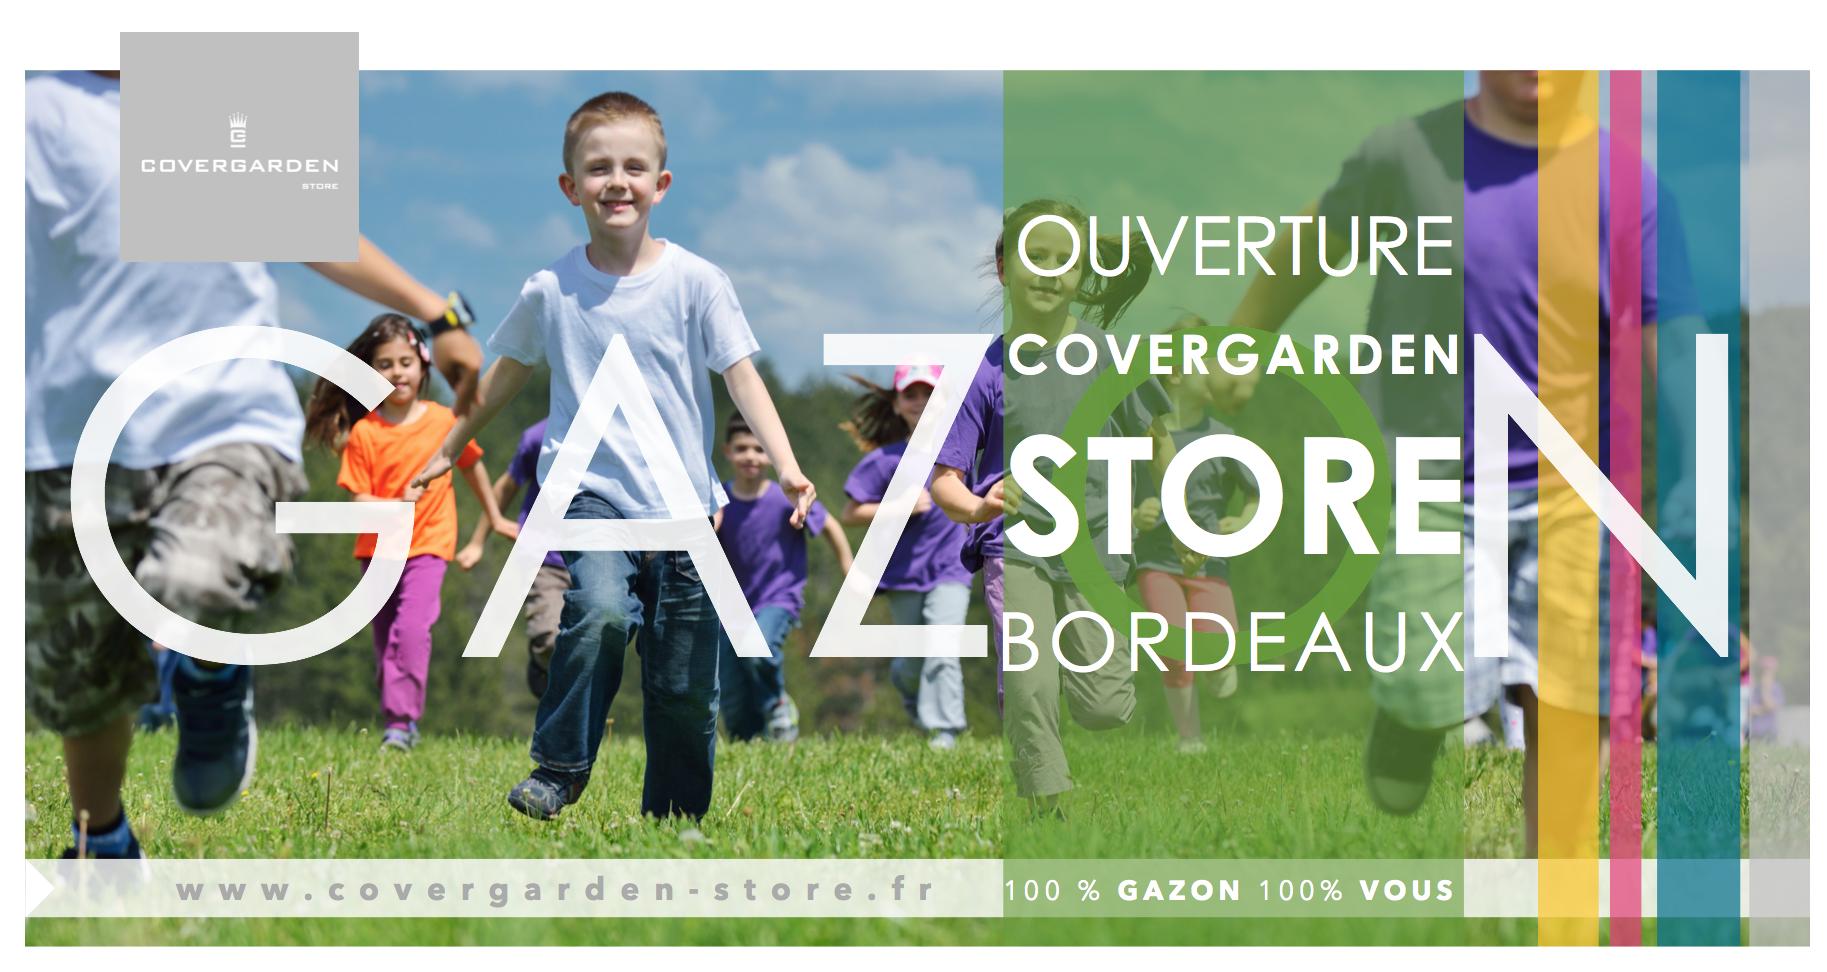 Covergarden Store Bordeaux Www Covergarden Store Fr Gazon En Rouleau Gazon Synthetique Semence Gazon Gazon En Rouleau Gazon Gazon Synthetique